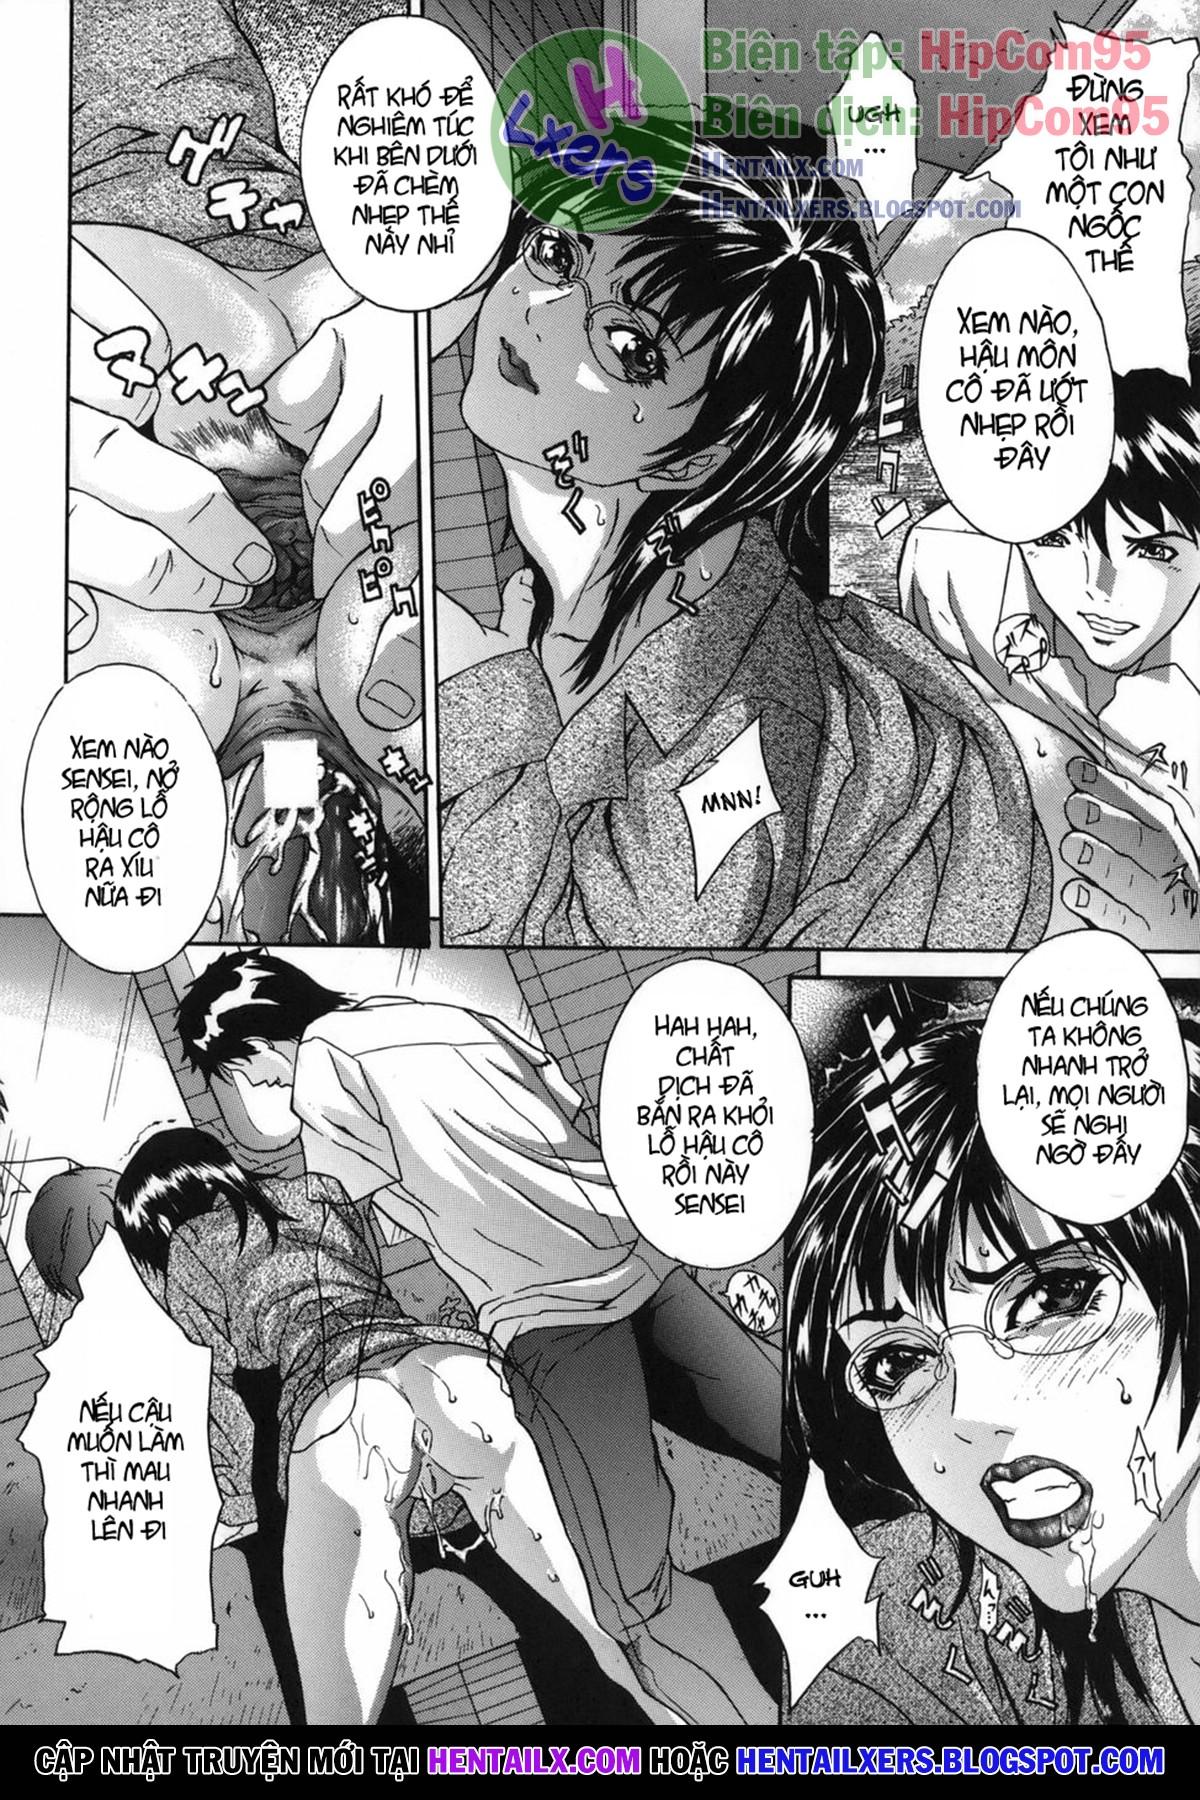 Hình ảnh 012_boinzuma_012 in Boinzuma - Motherlike Obscene Wife